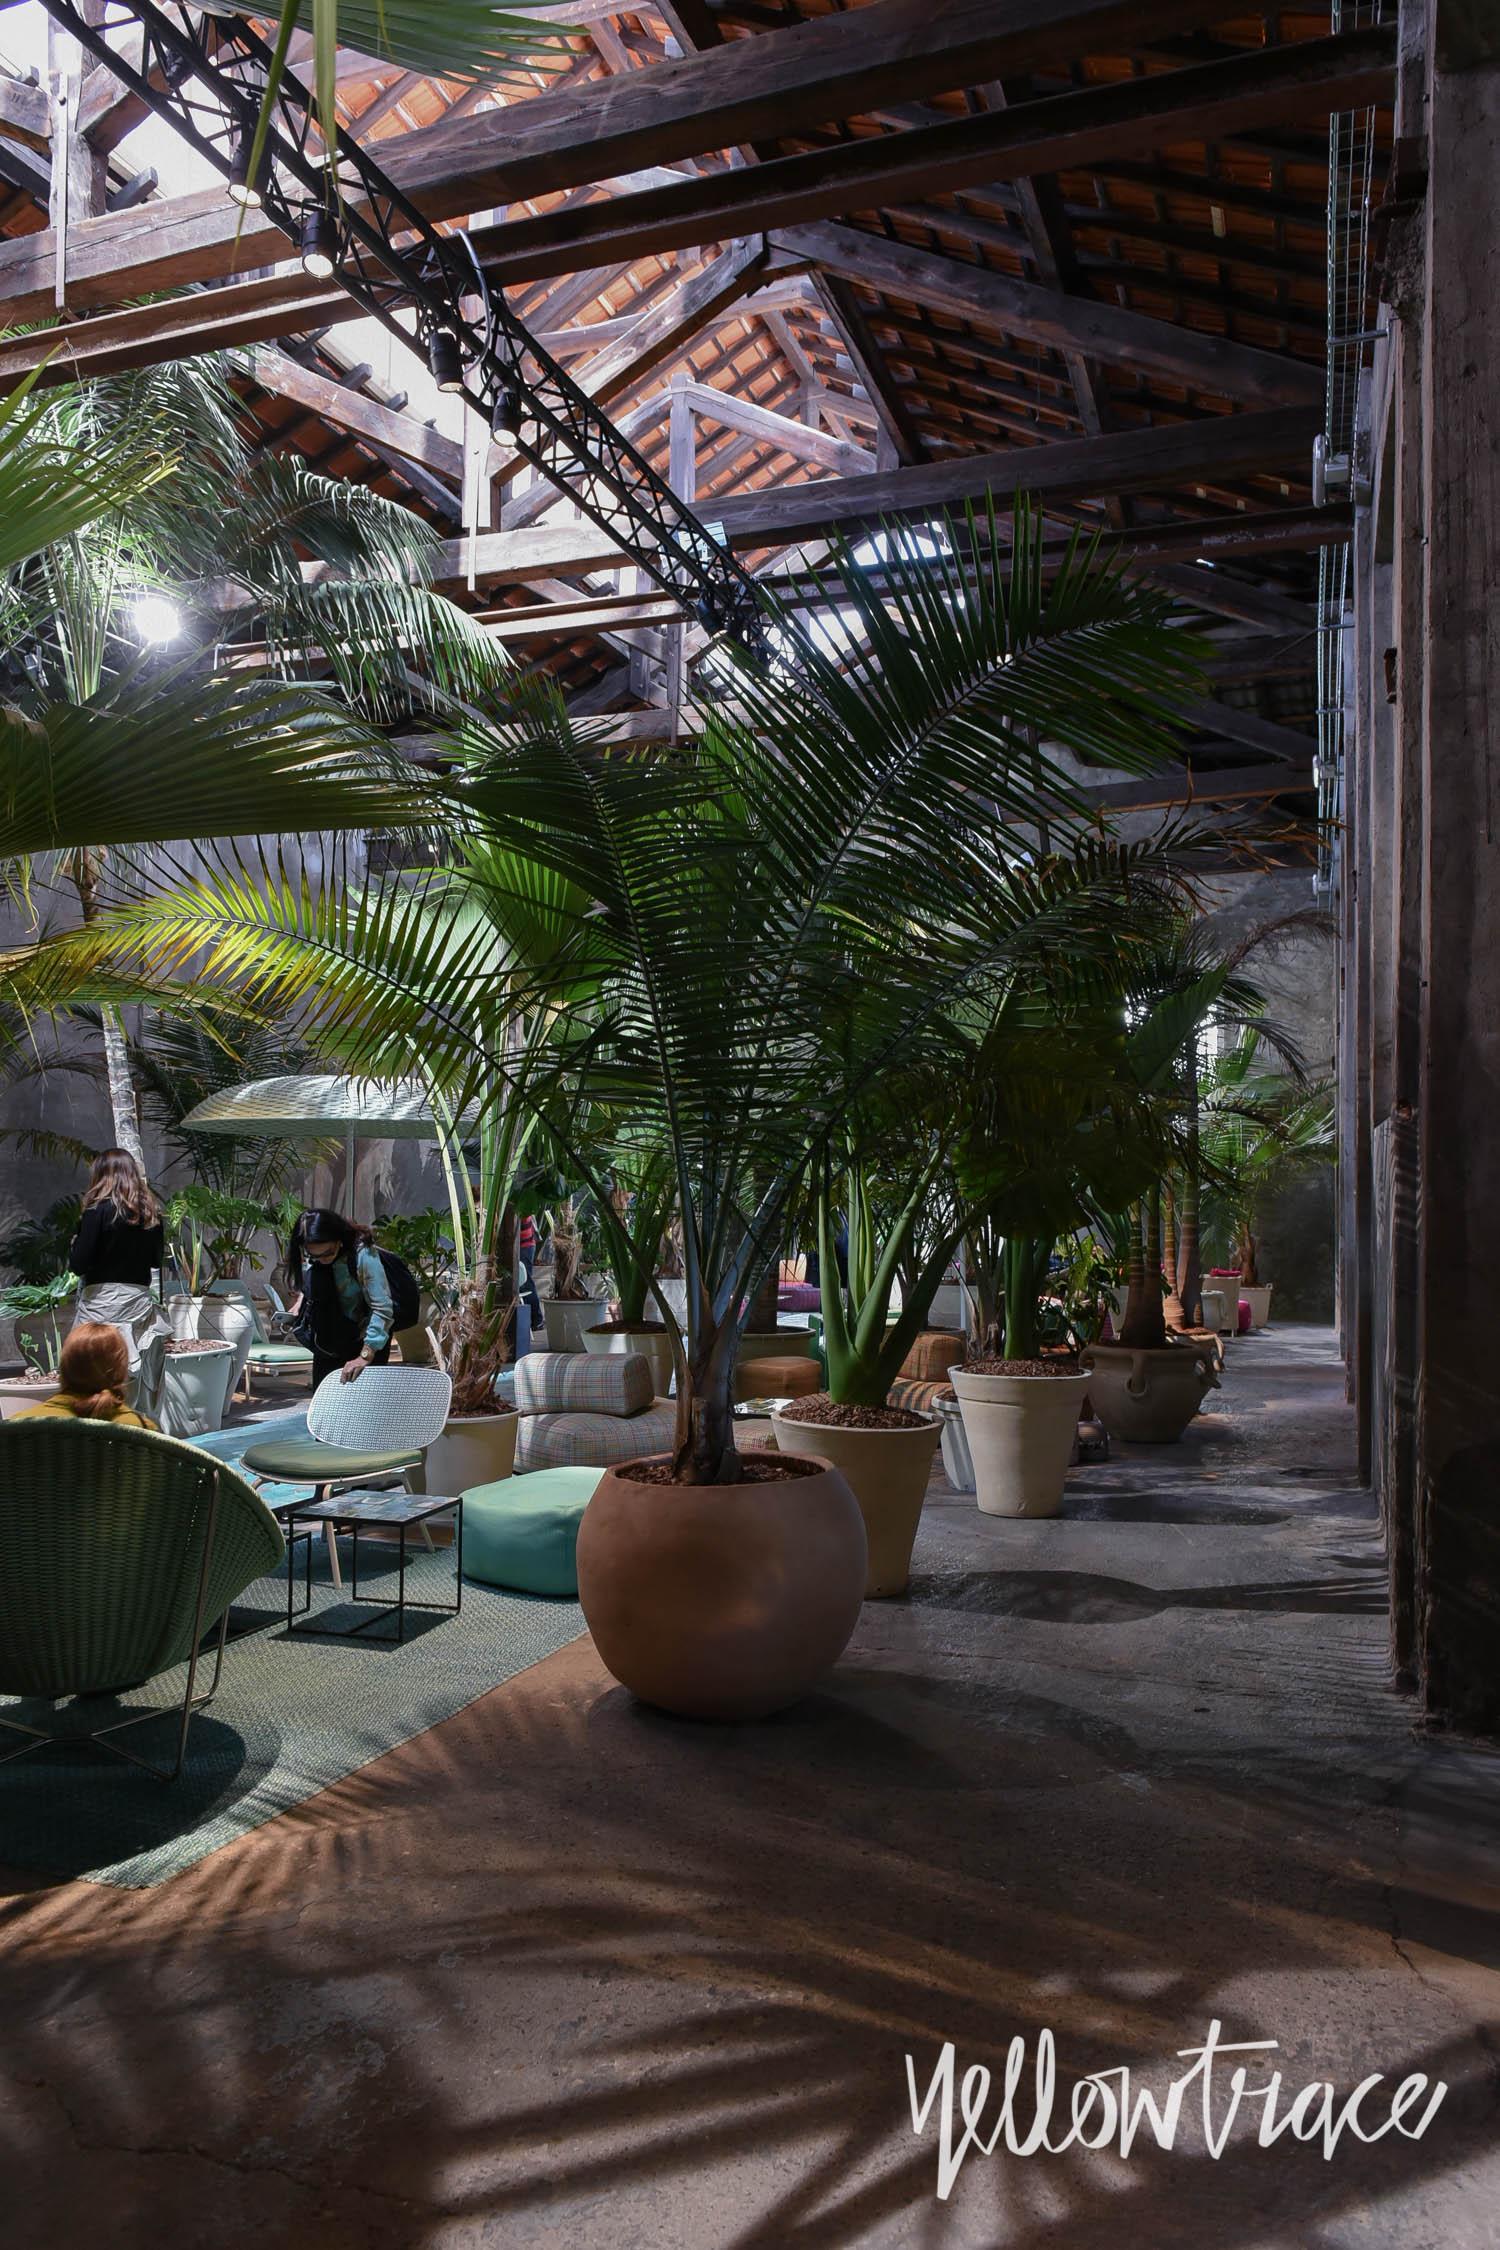 Milan Design Week 2017 Highlights, Paola Lenti, Photo © Nick Hughes | #Milantrace2017